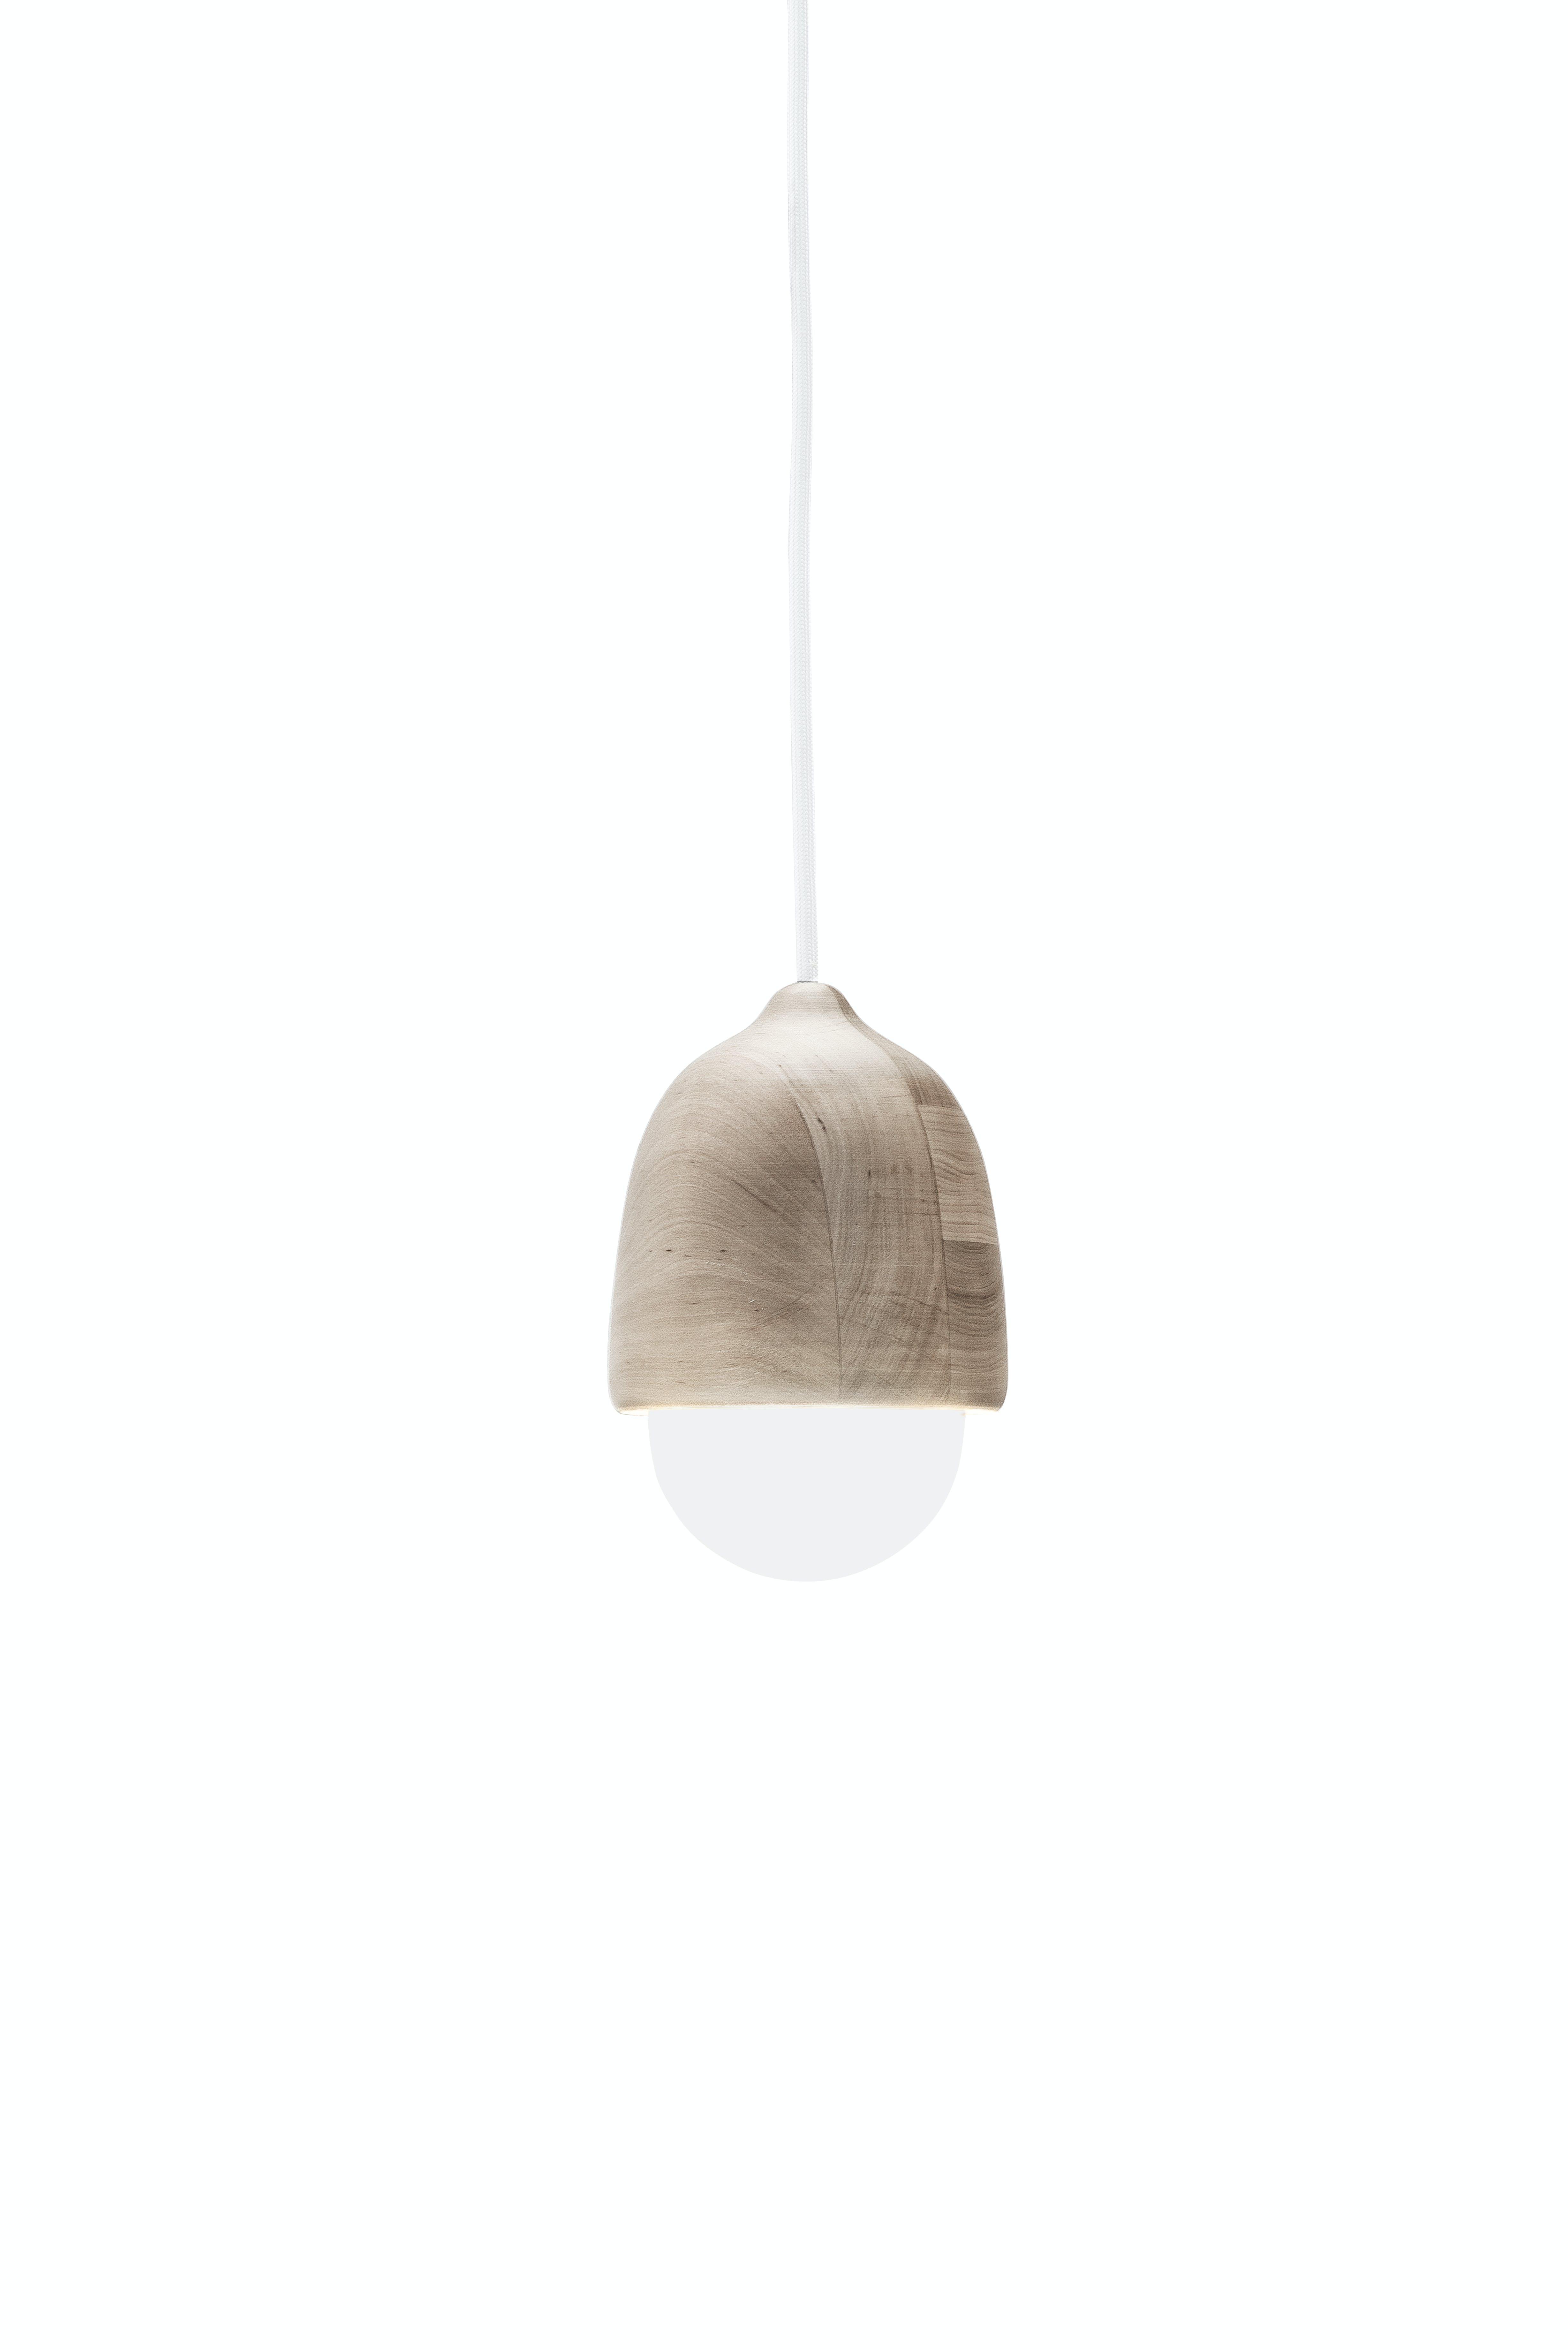 Mater Natural Small Terho Pendant Lamp Haute Living